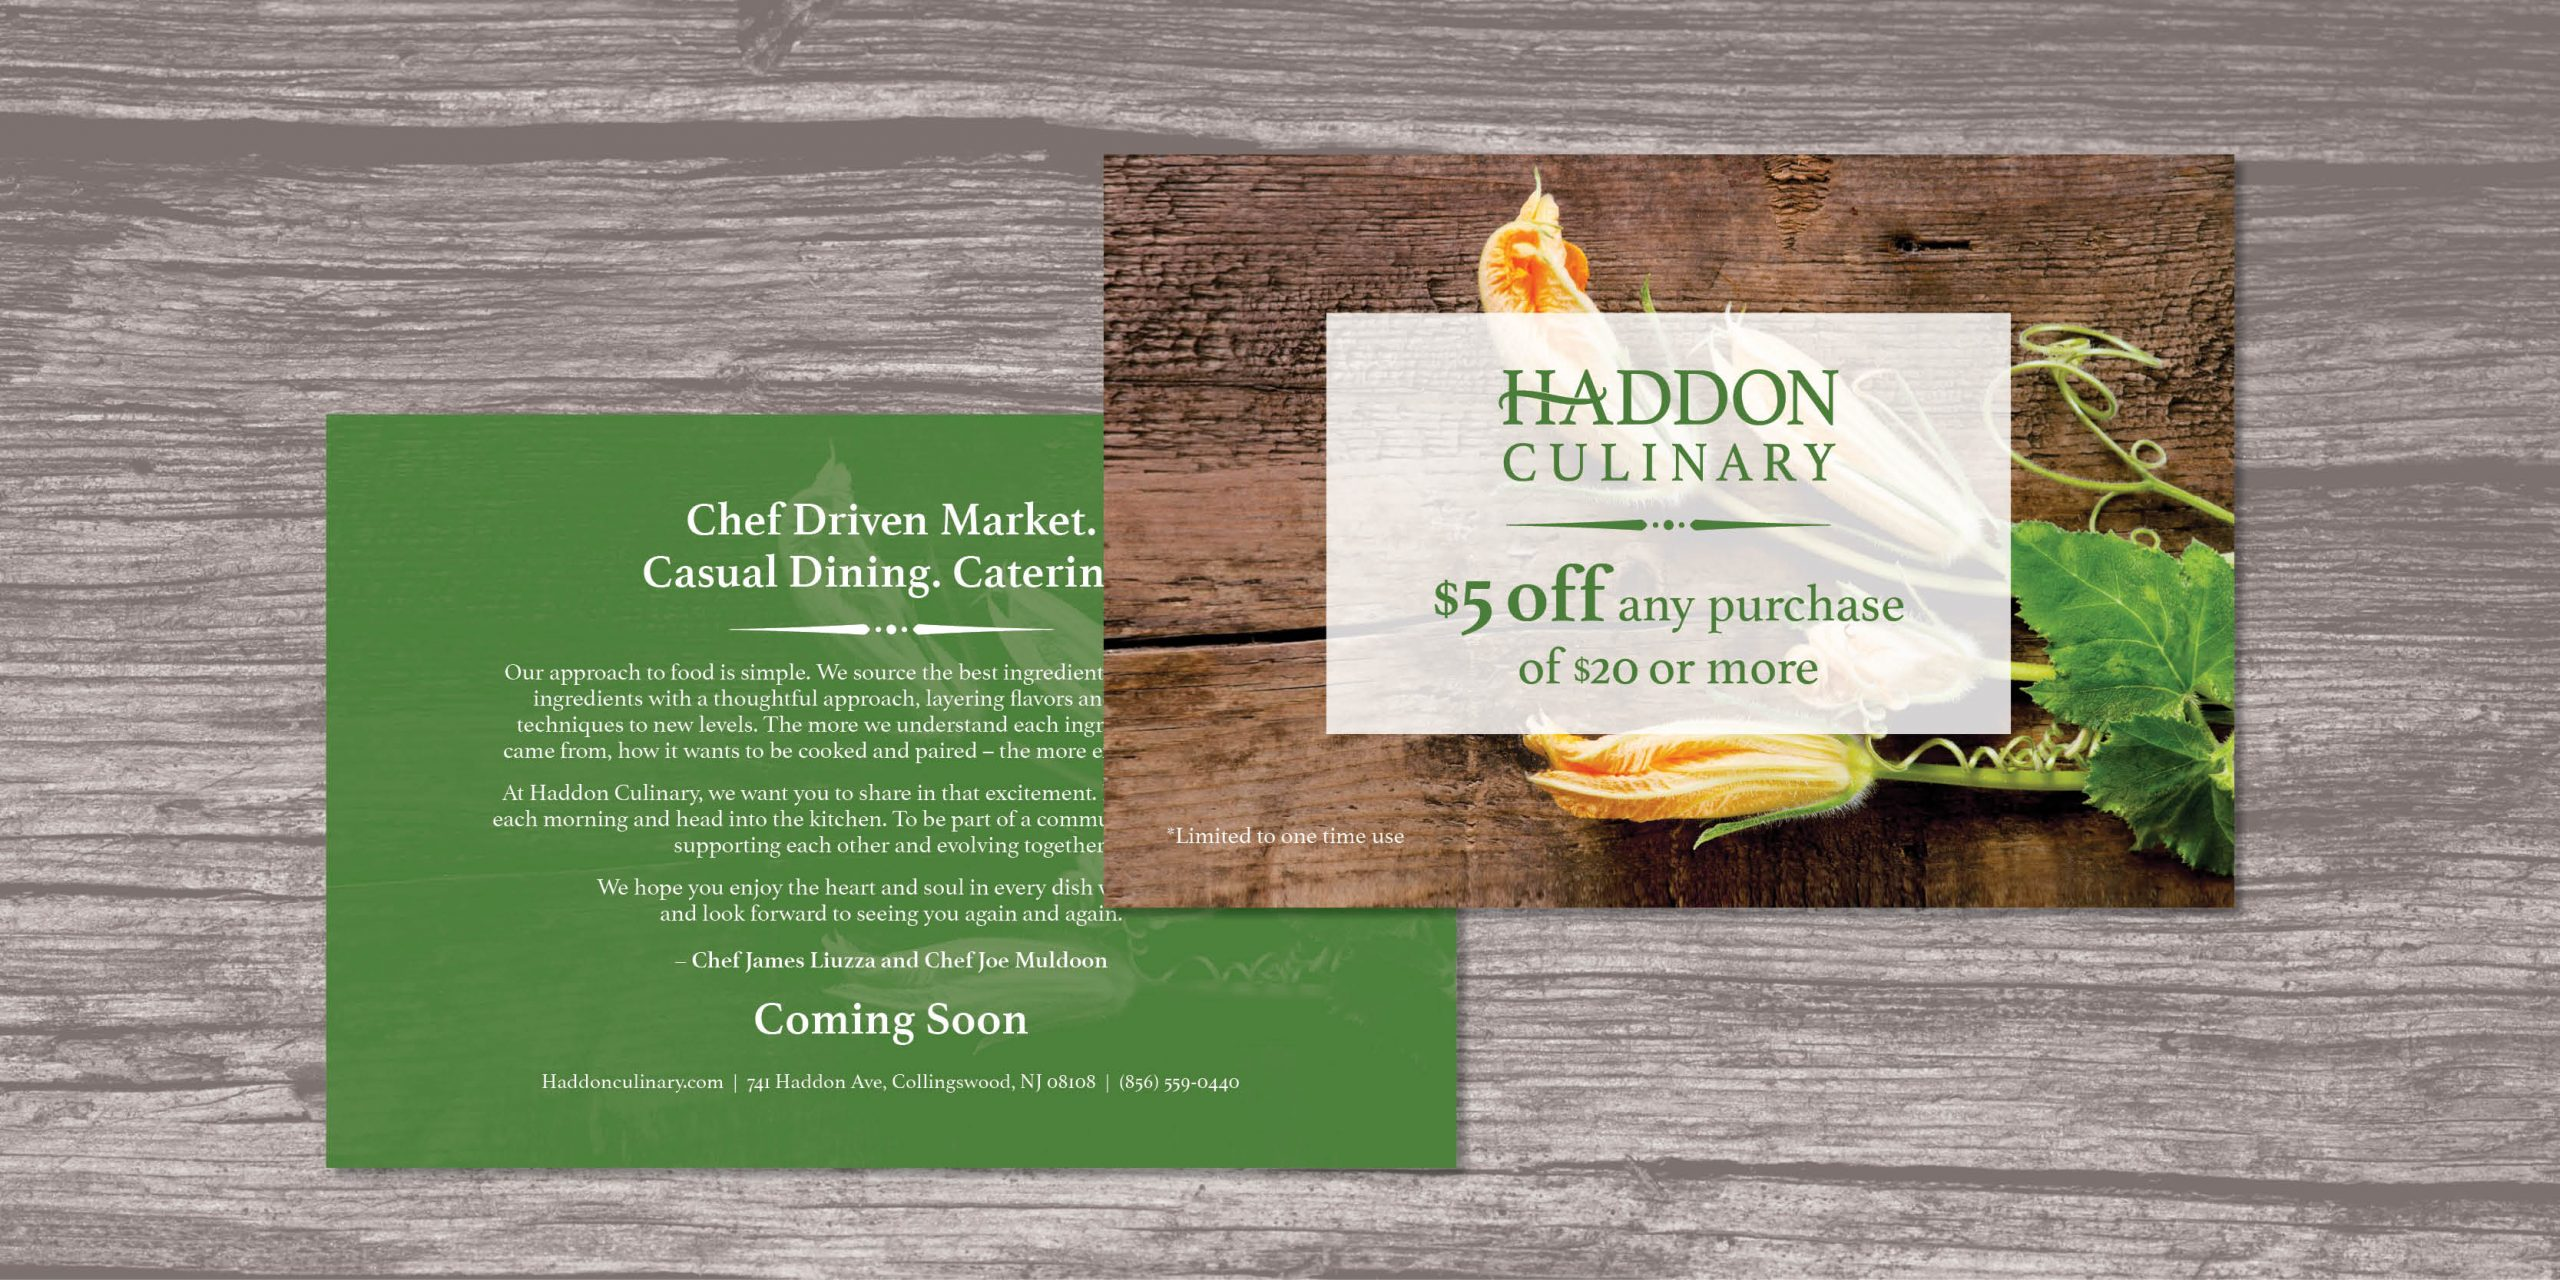 Haddon-Portfolio-Page3